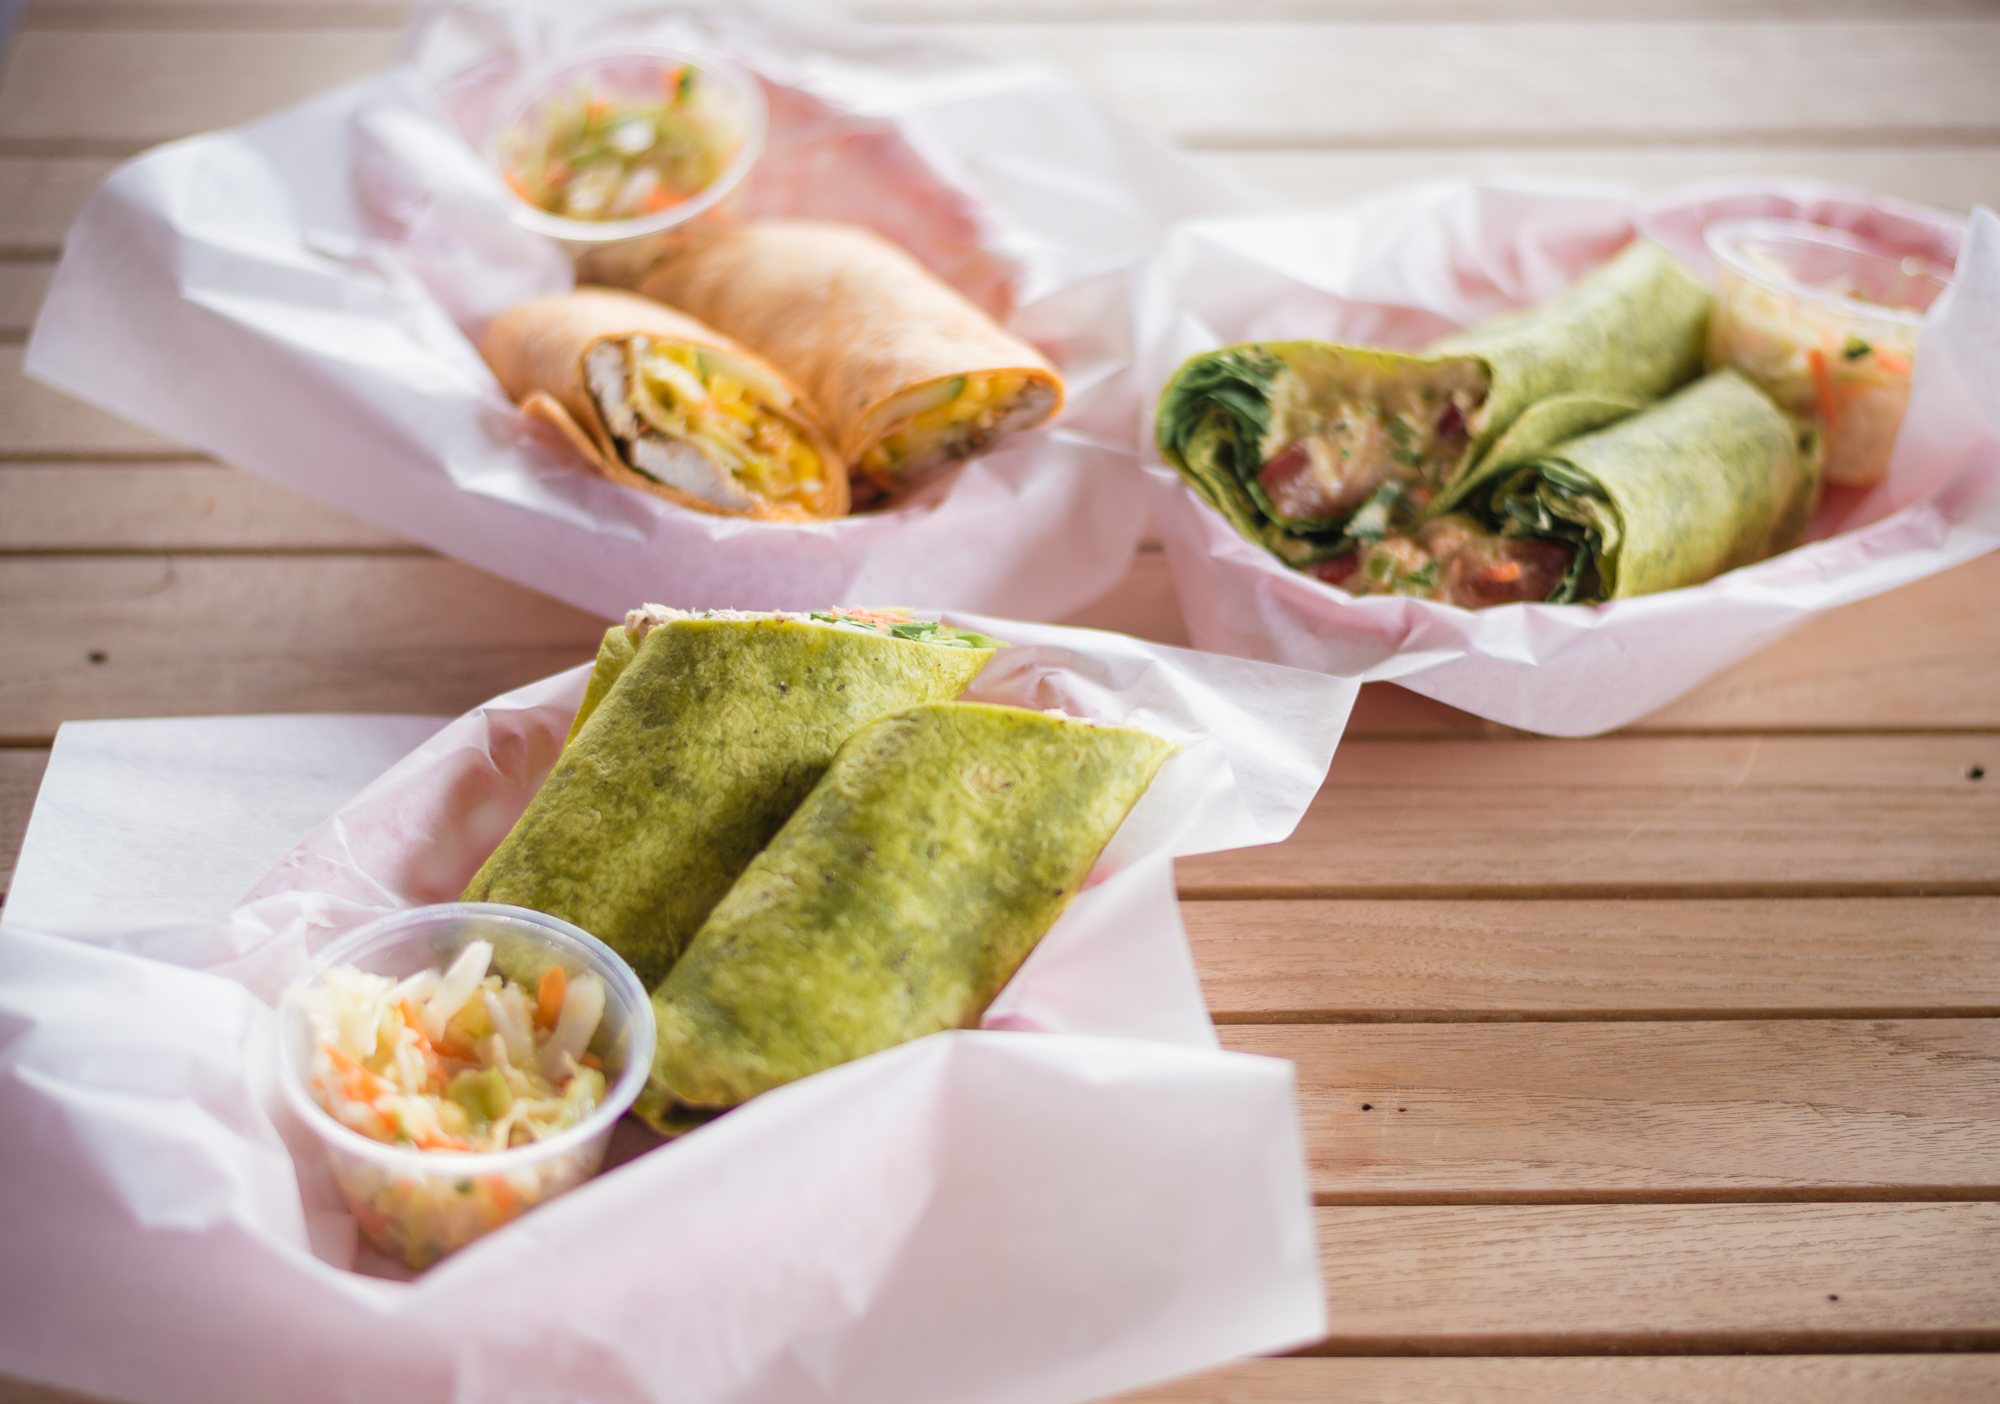 Jerk Wrap, Tuna Wrap and Hummus Wrap